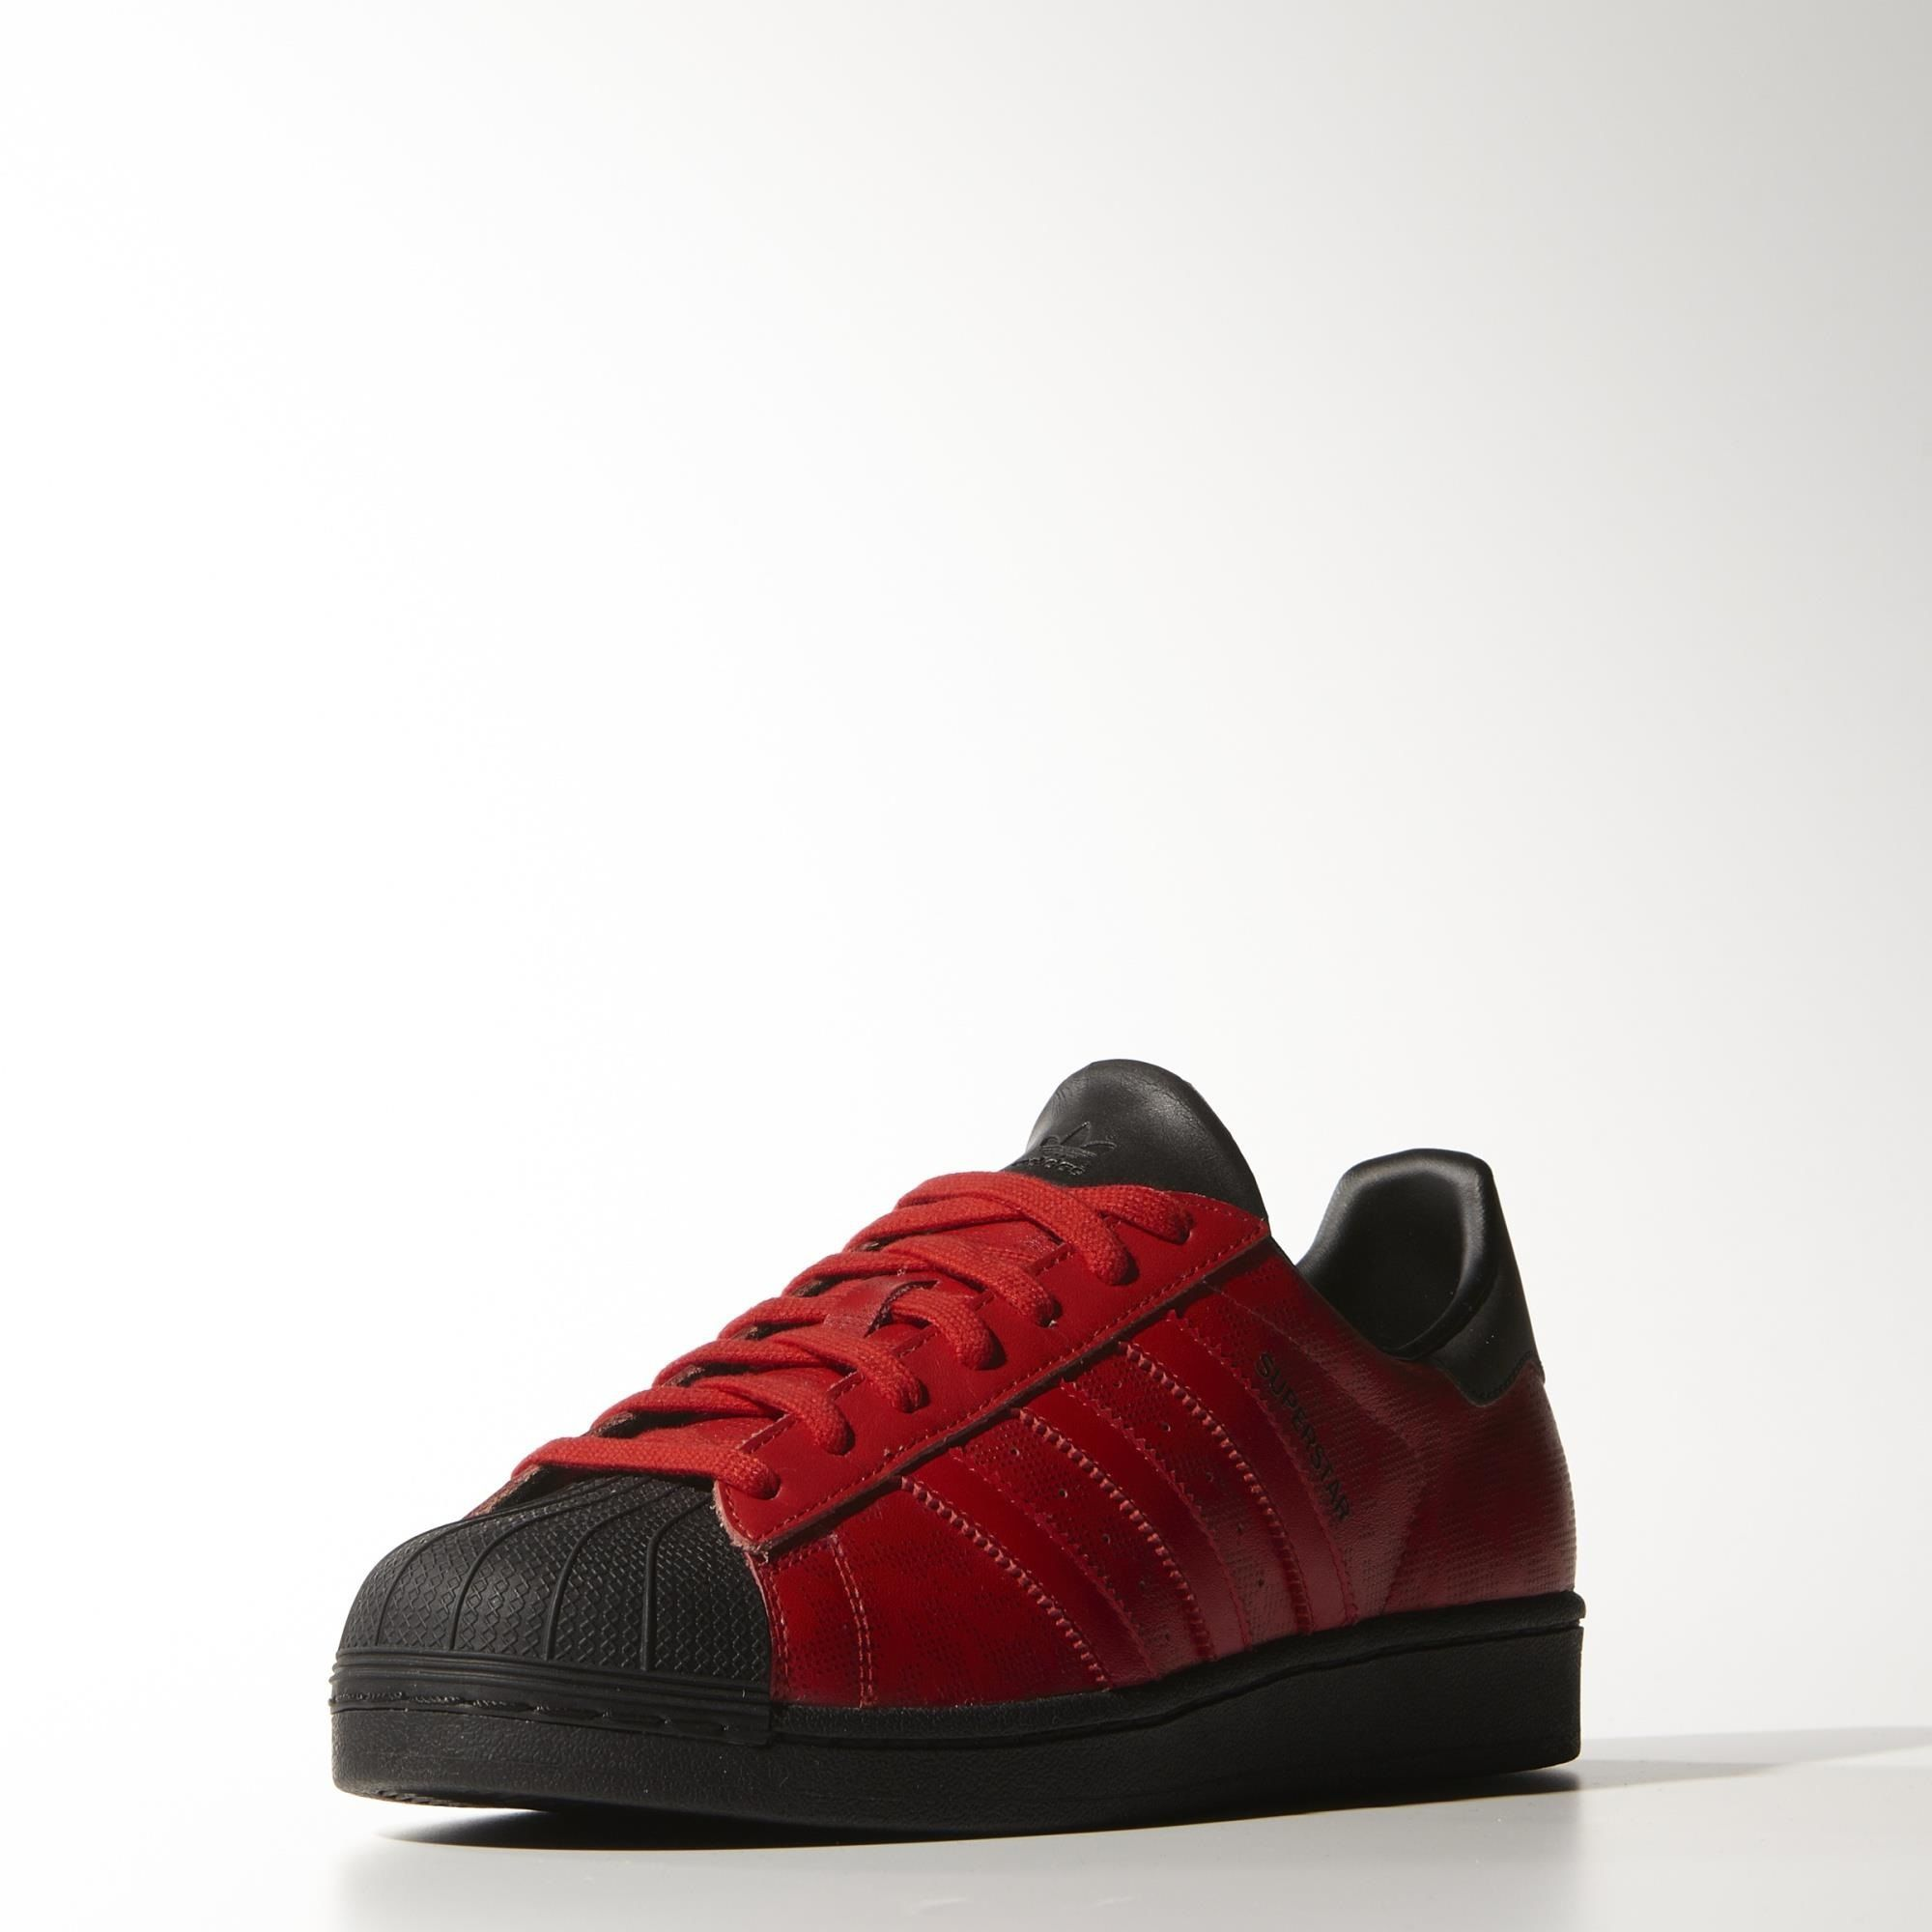 on sale ebb12 6d26a adidas - Superstar Camo 15 Shoes